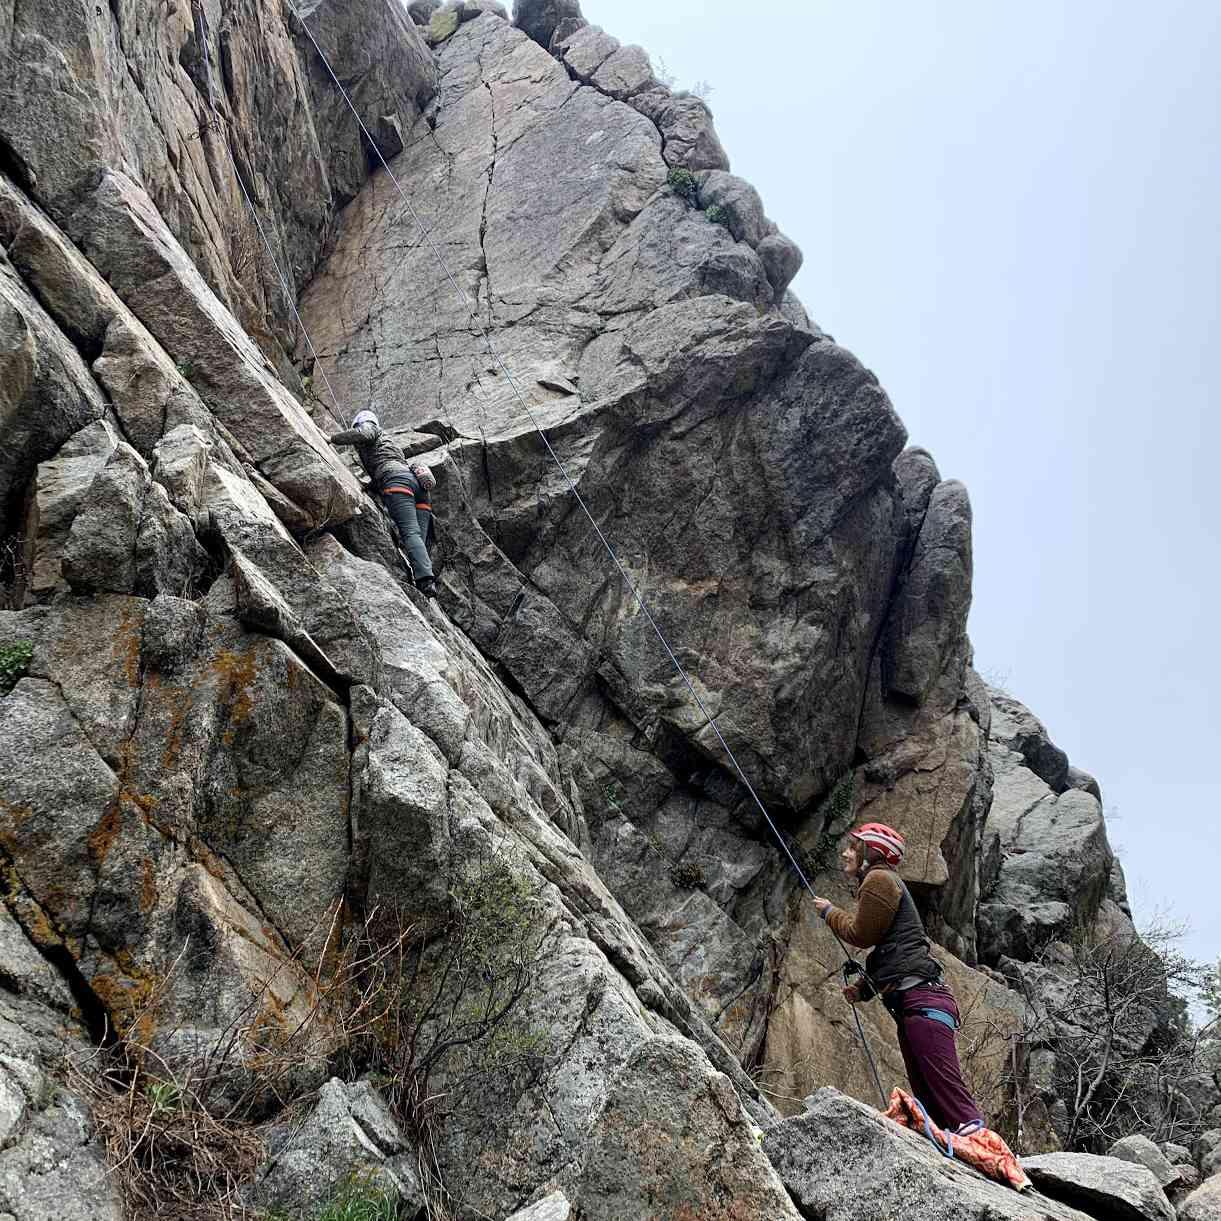 Author climbing while partner belays